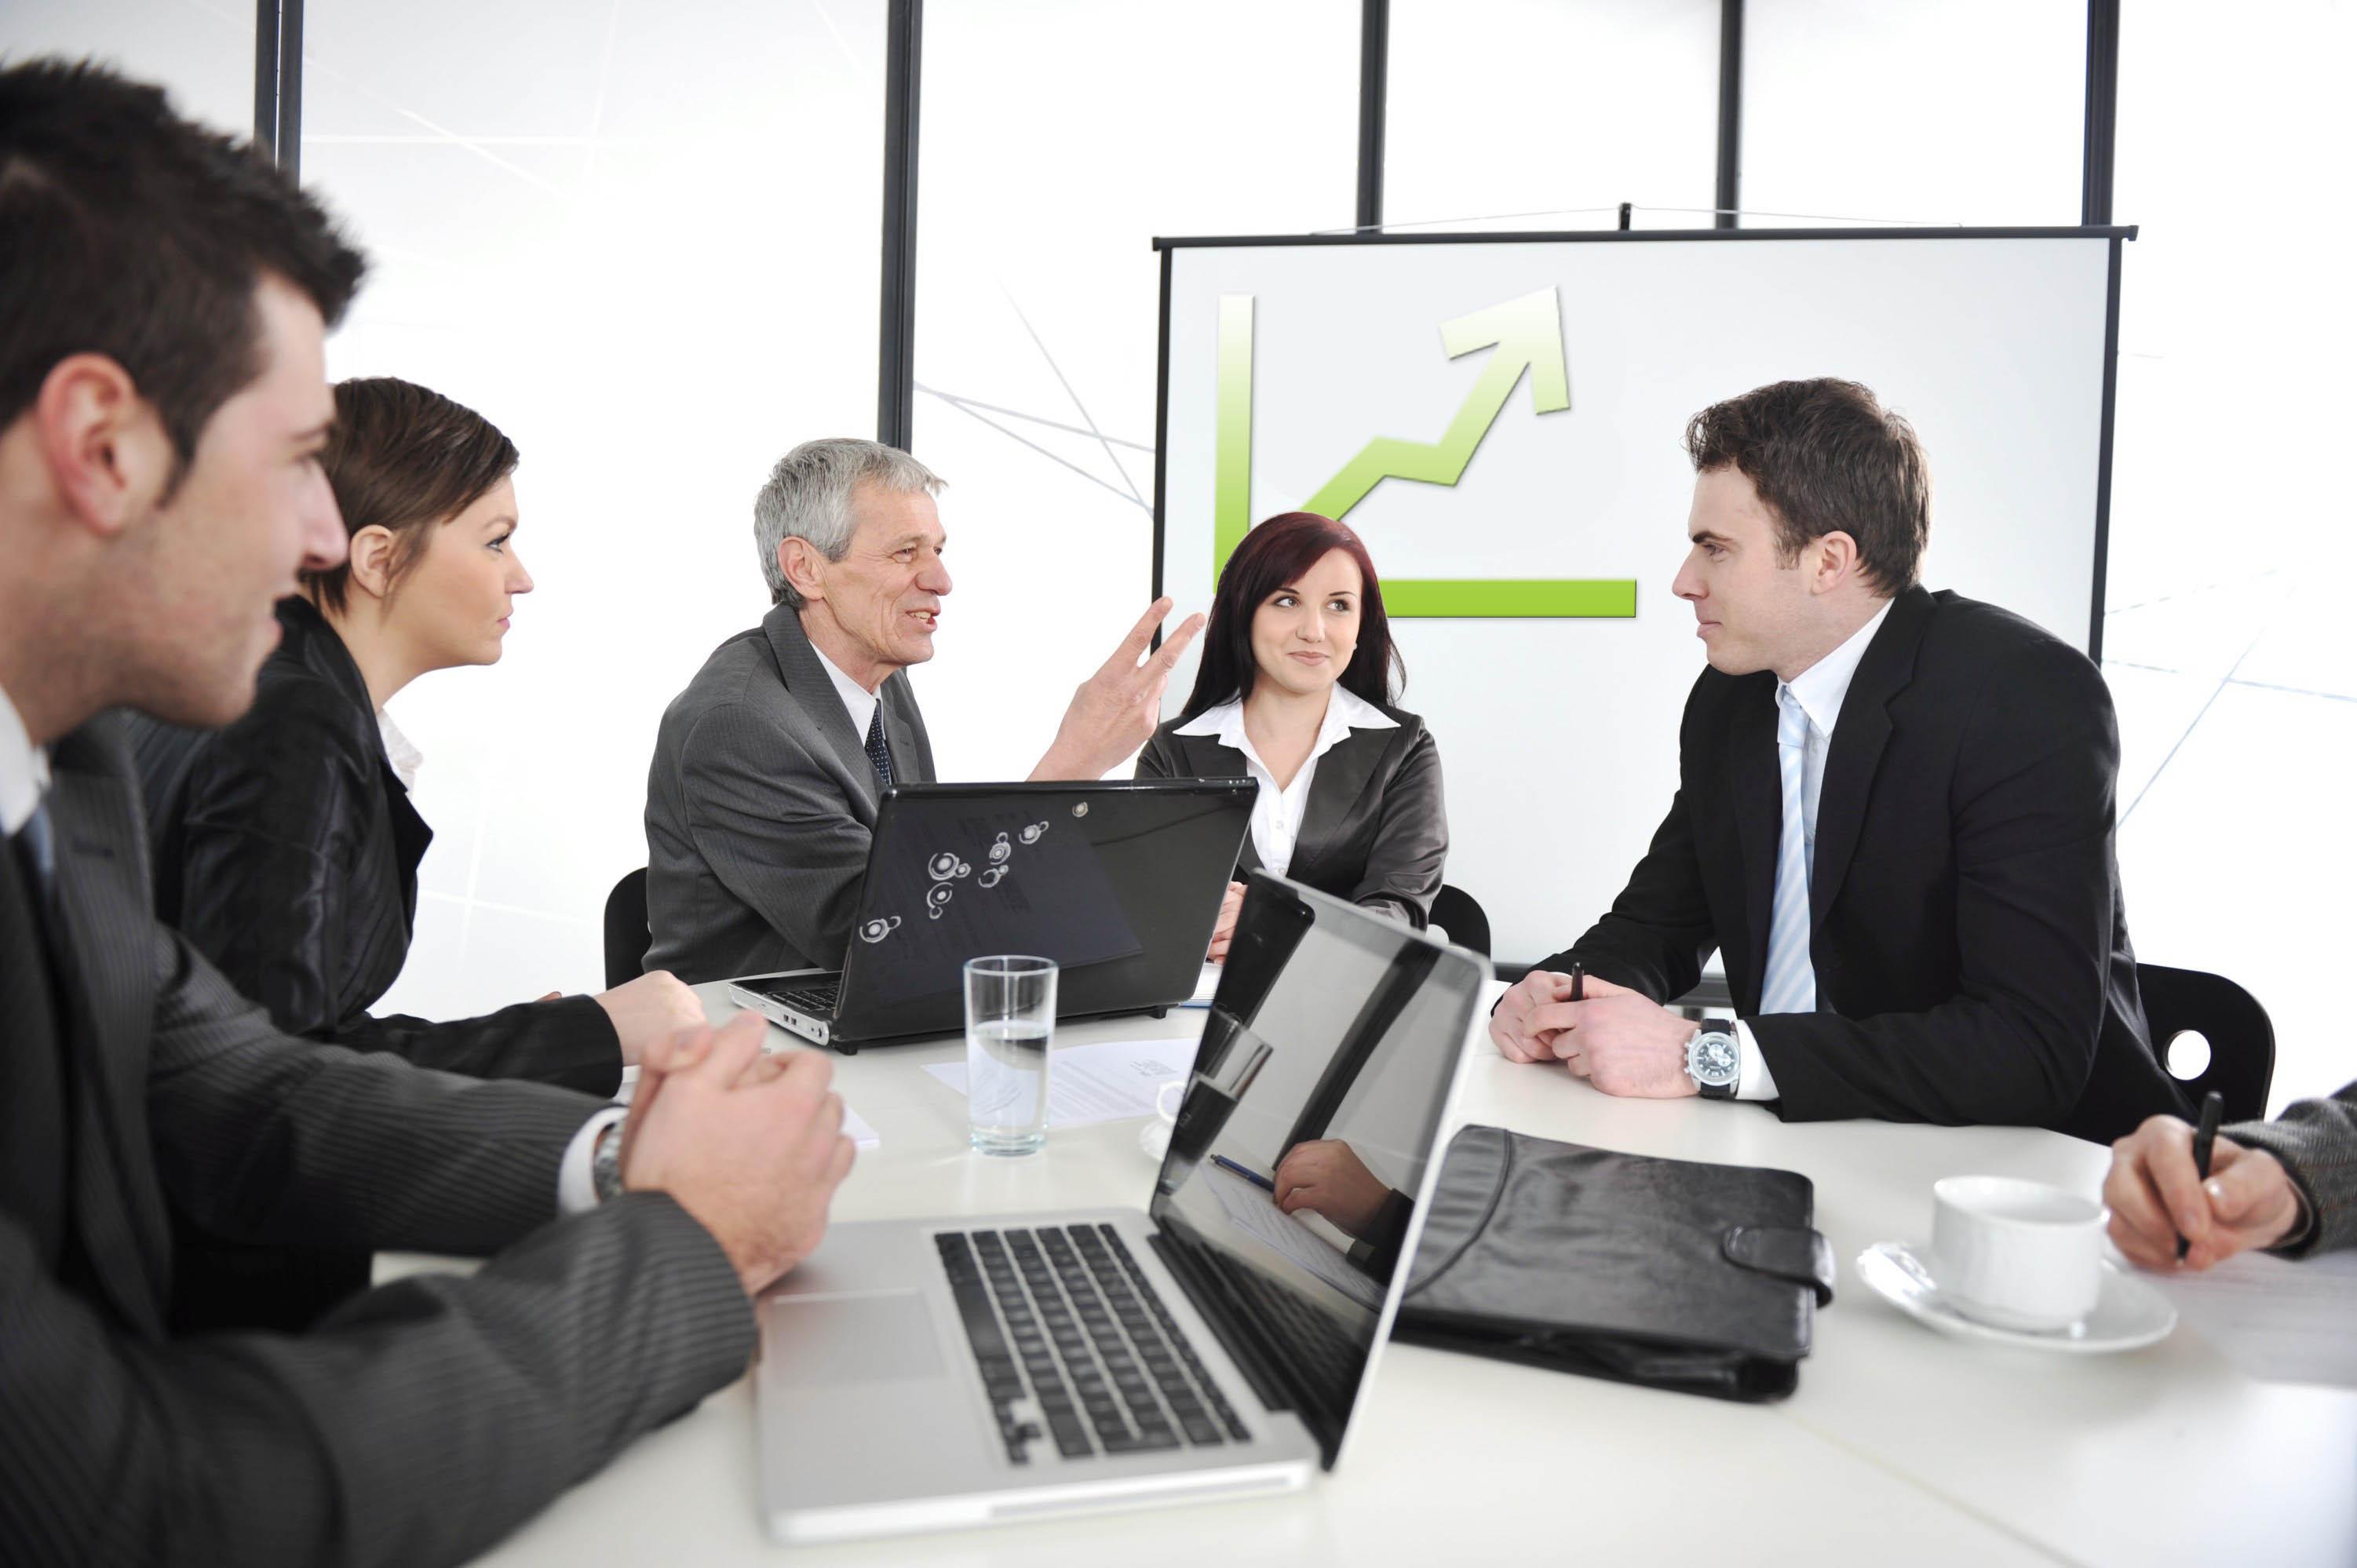 Plan 4 Profit Business Planning